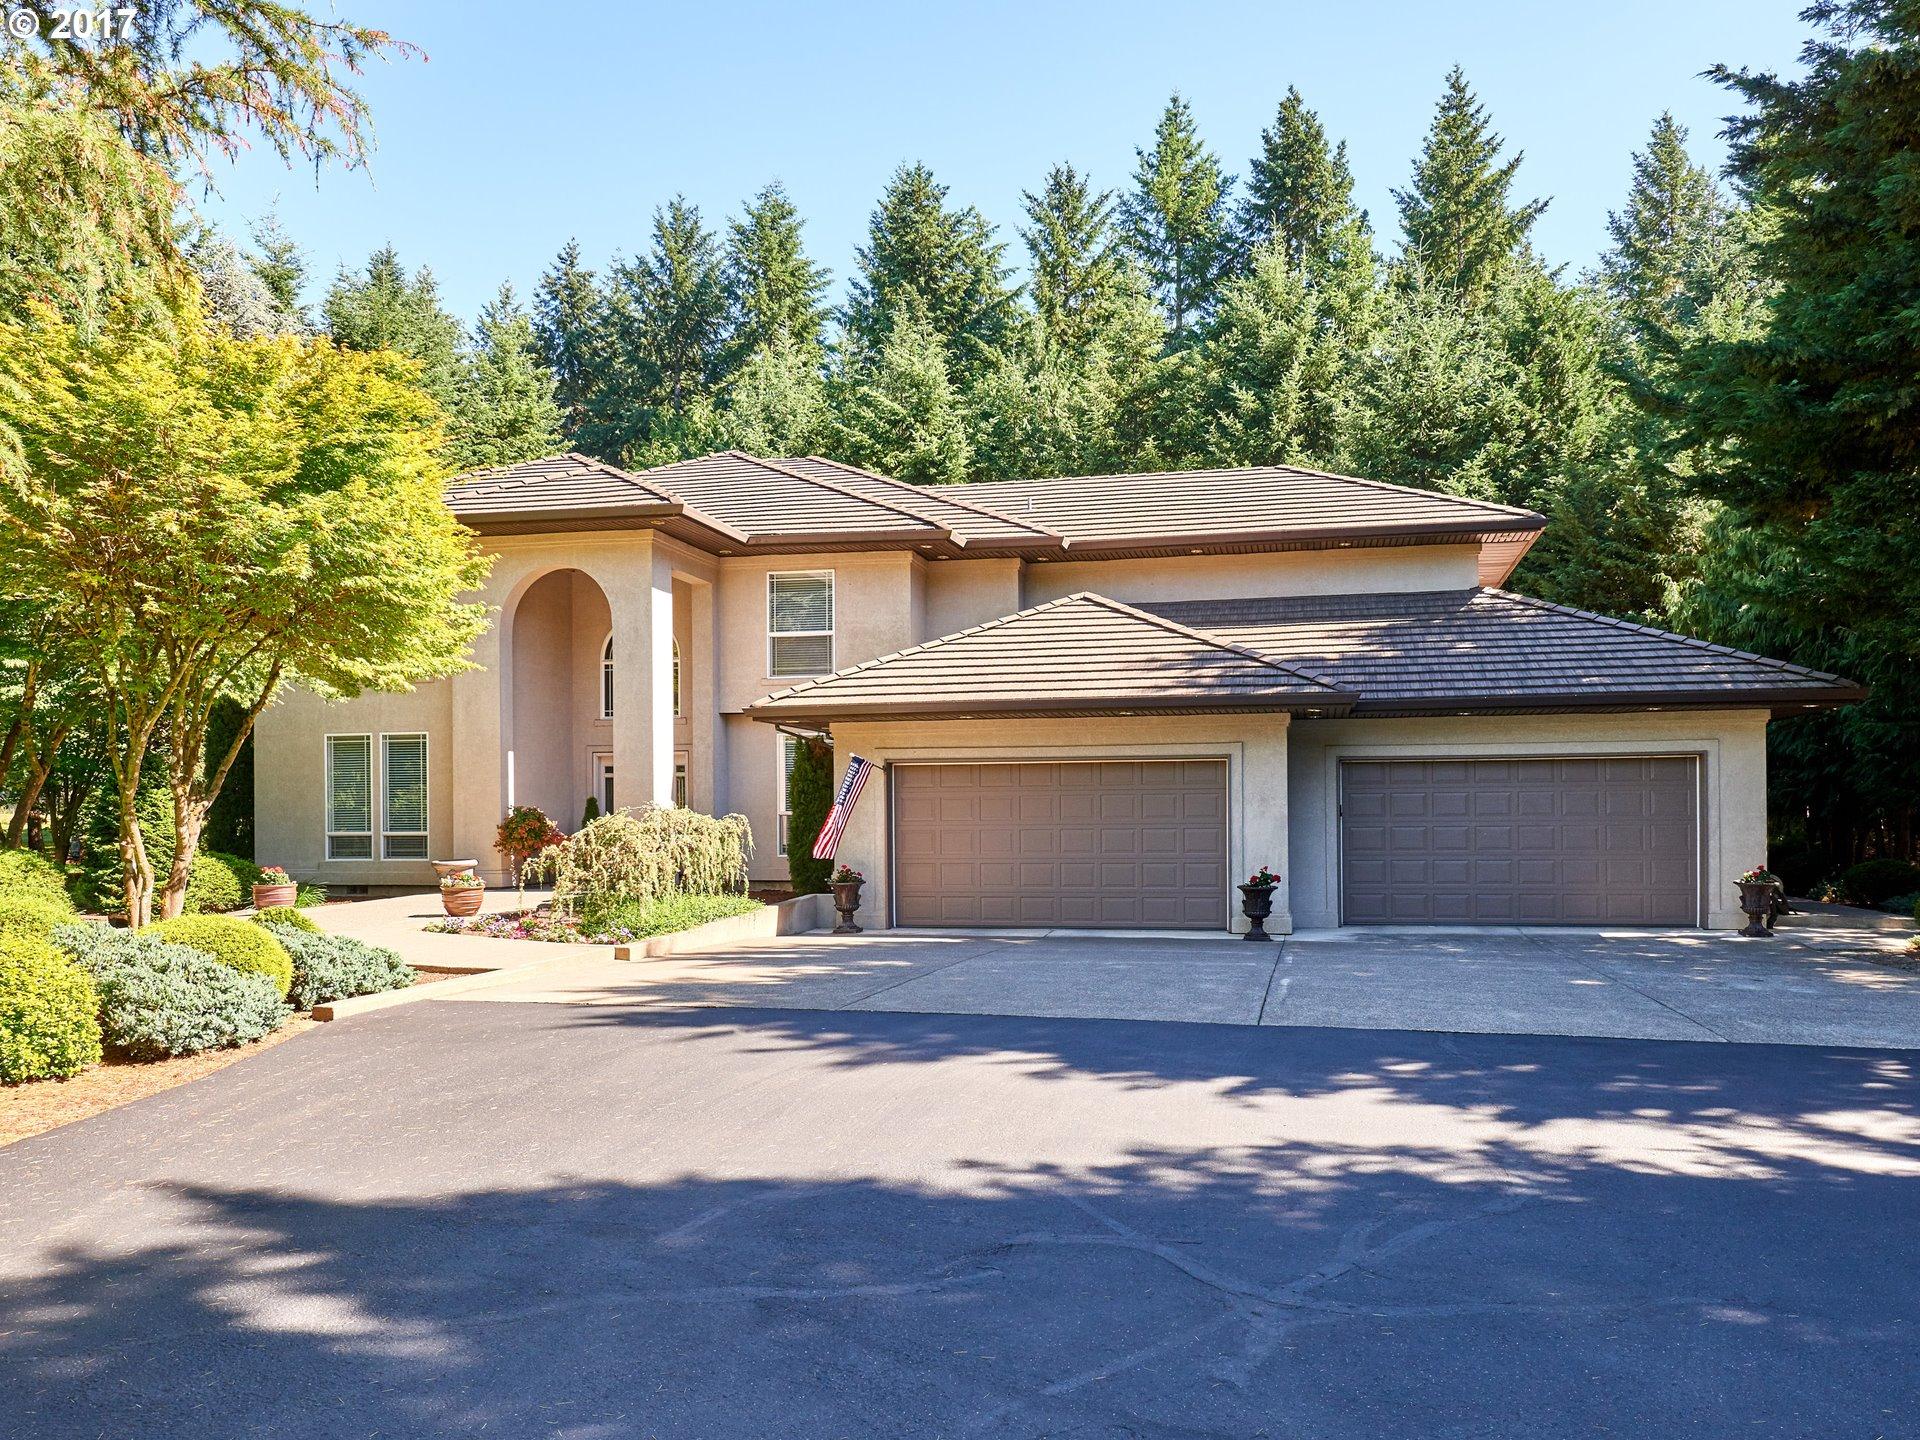 16606 S REDLAND RD, Oregon City OR 97045